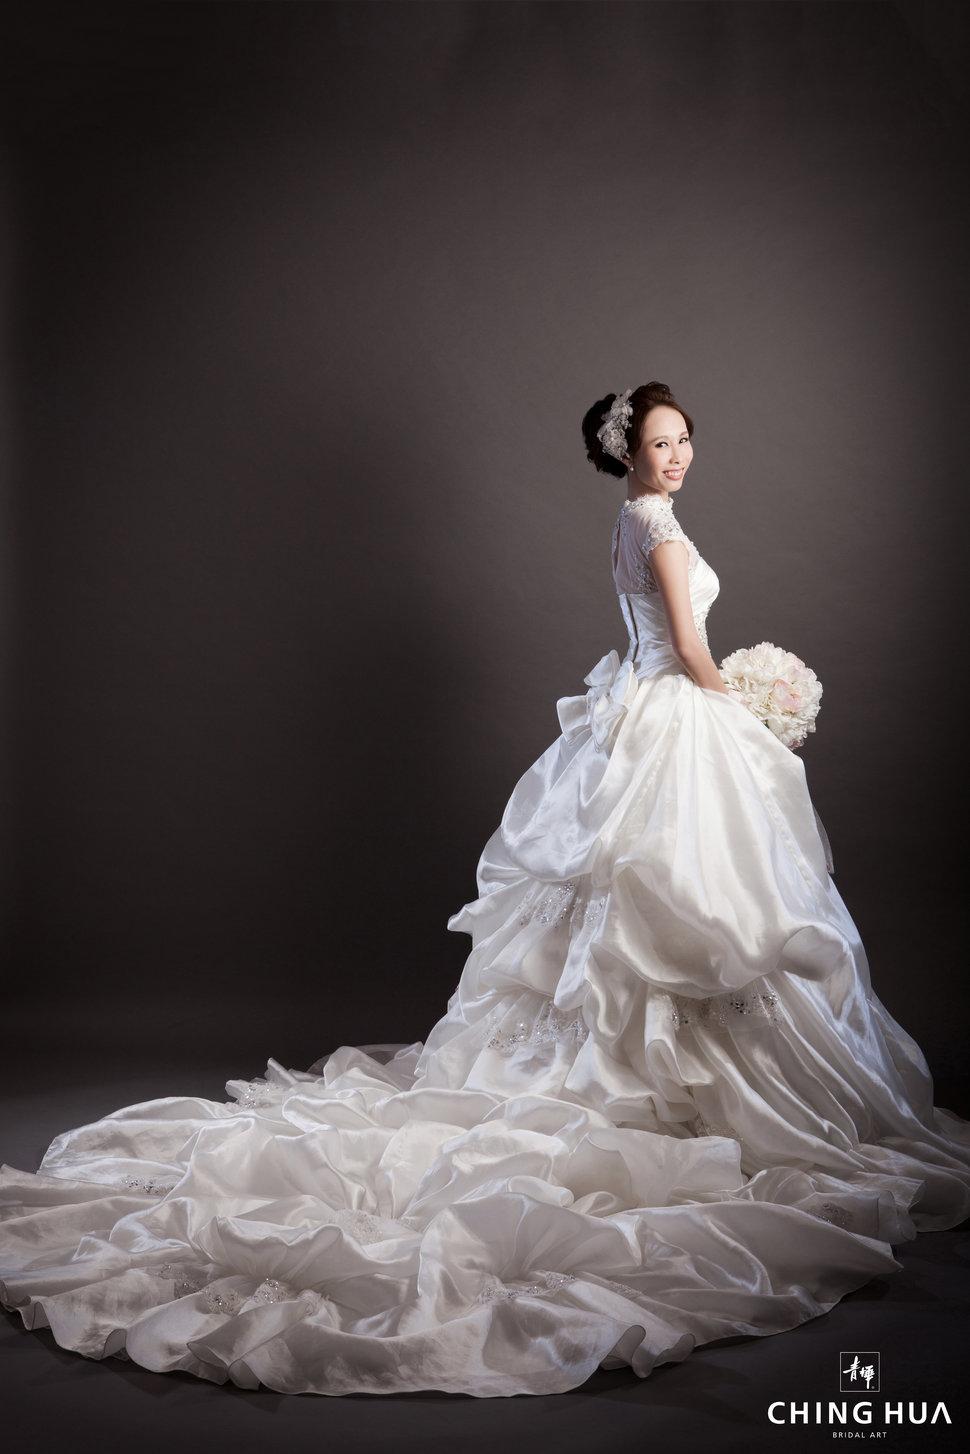 (編號:397194) - 青樺婚紗CHINGHUA - 結婚吧